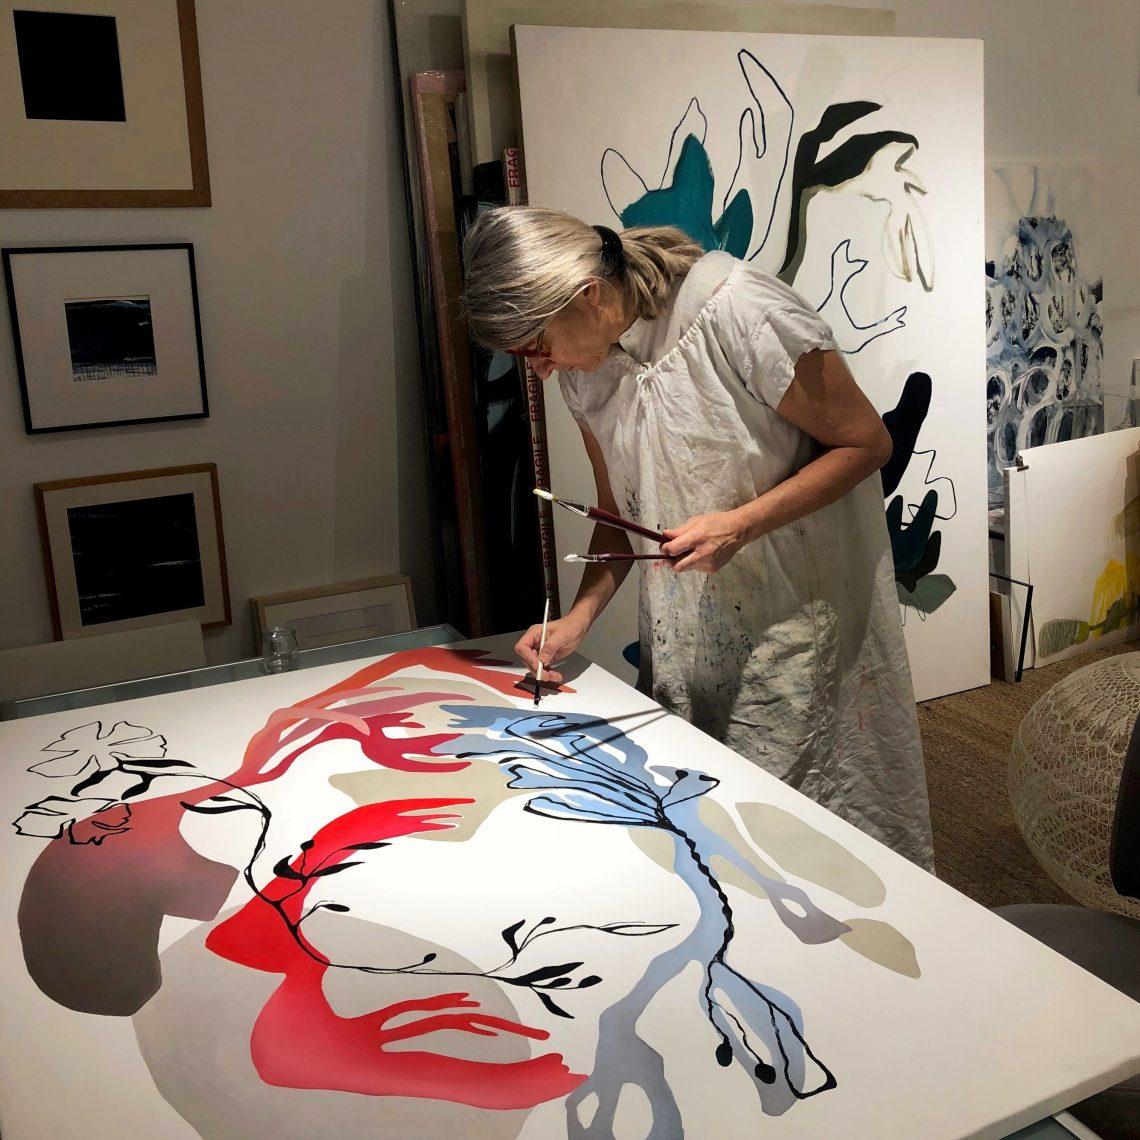 Artiste féminine Nathalie Leverger dans son atelier